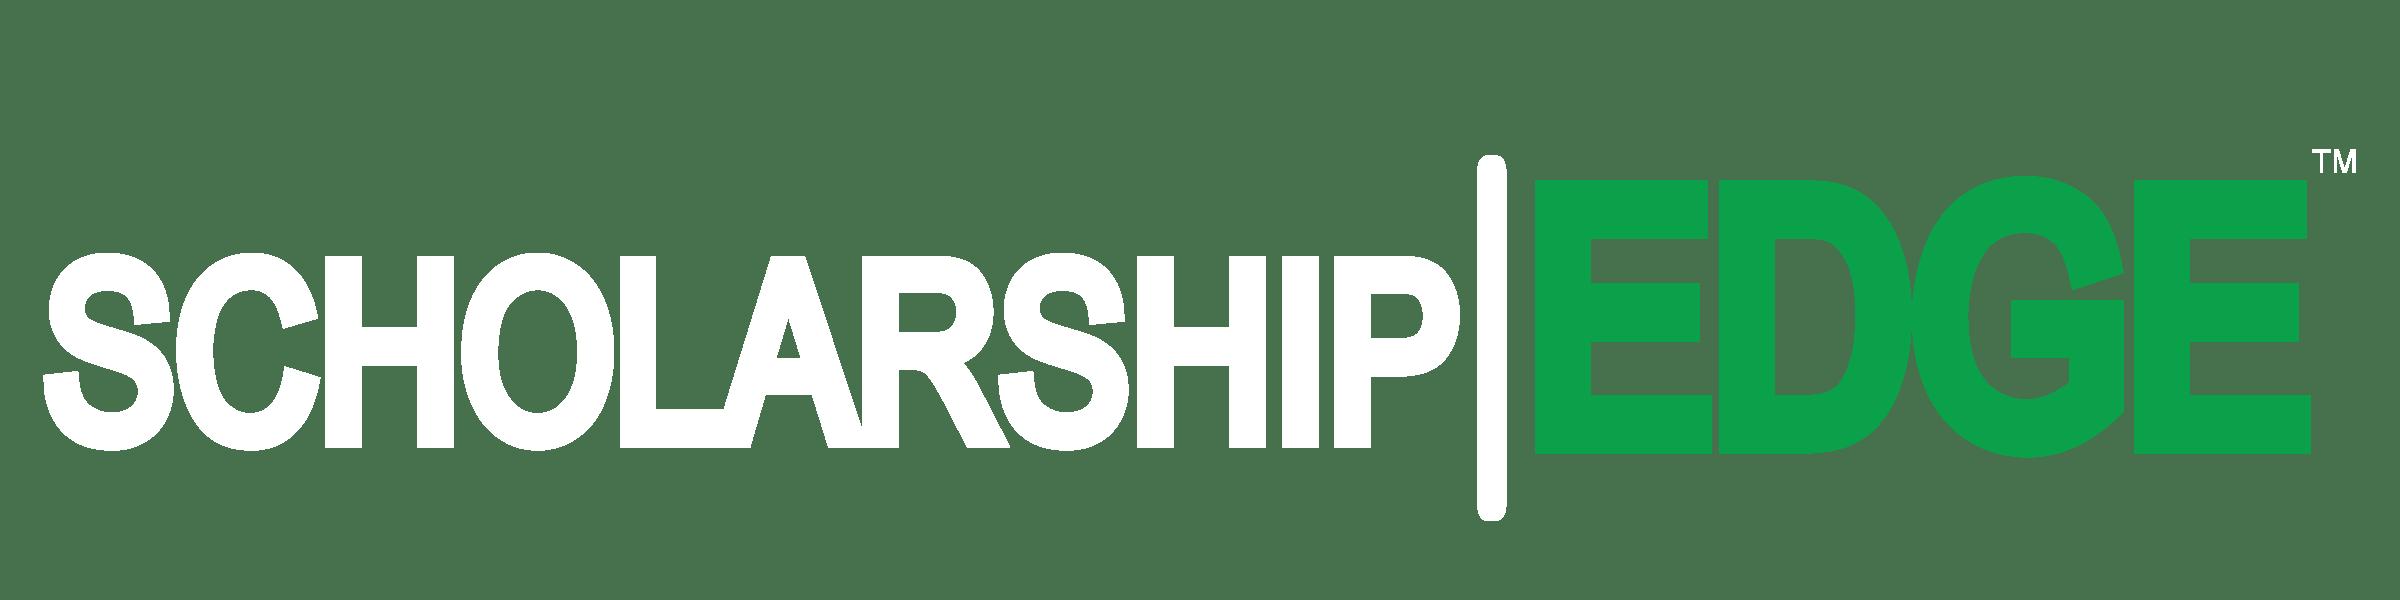 Scholarship Informer